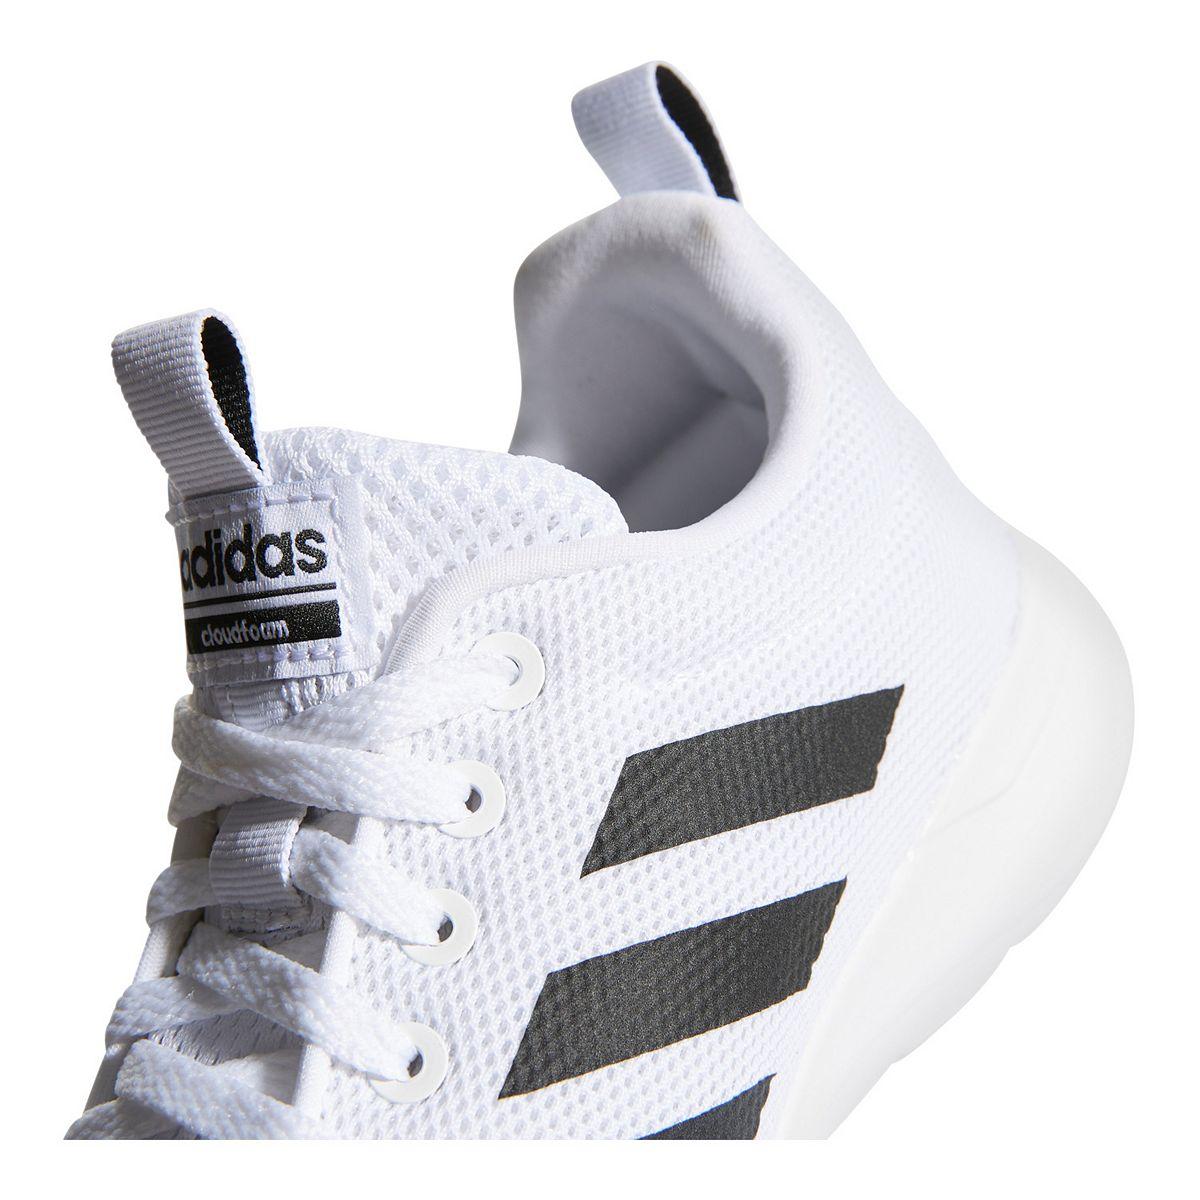 adidas Lite Racer CLN Women's Sneakers White Gray nYjuD